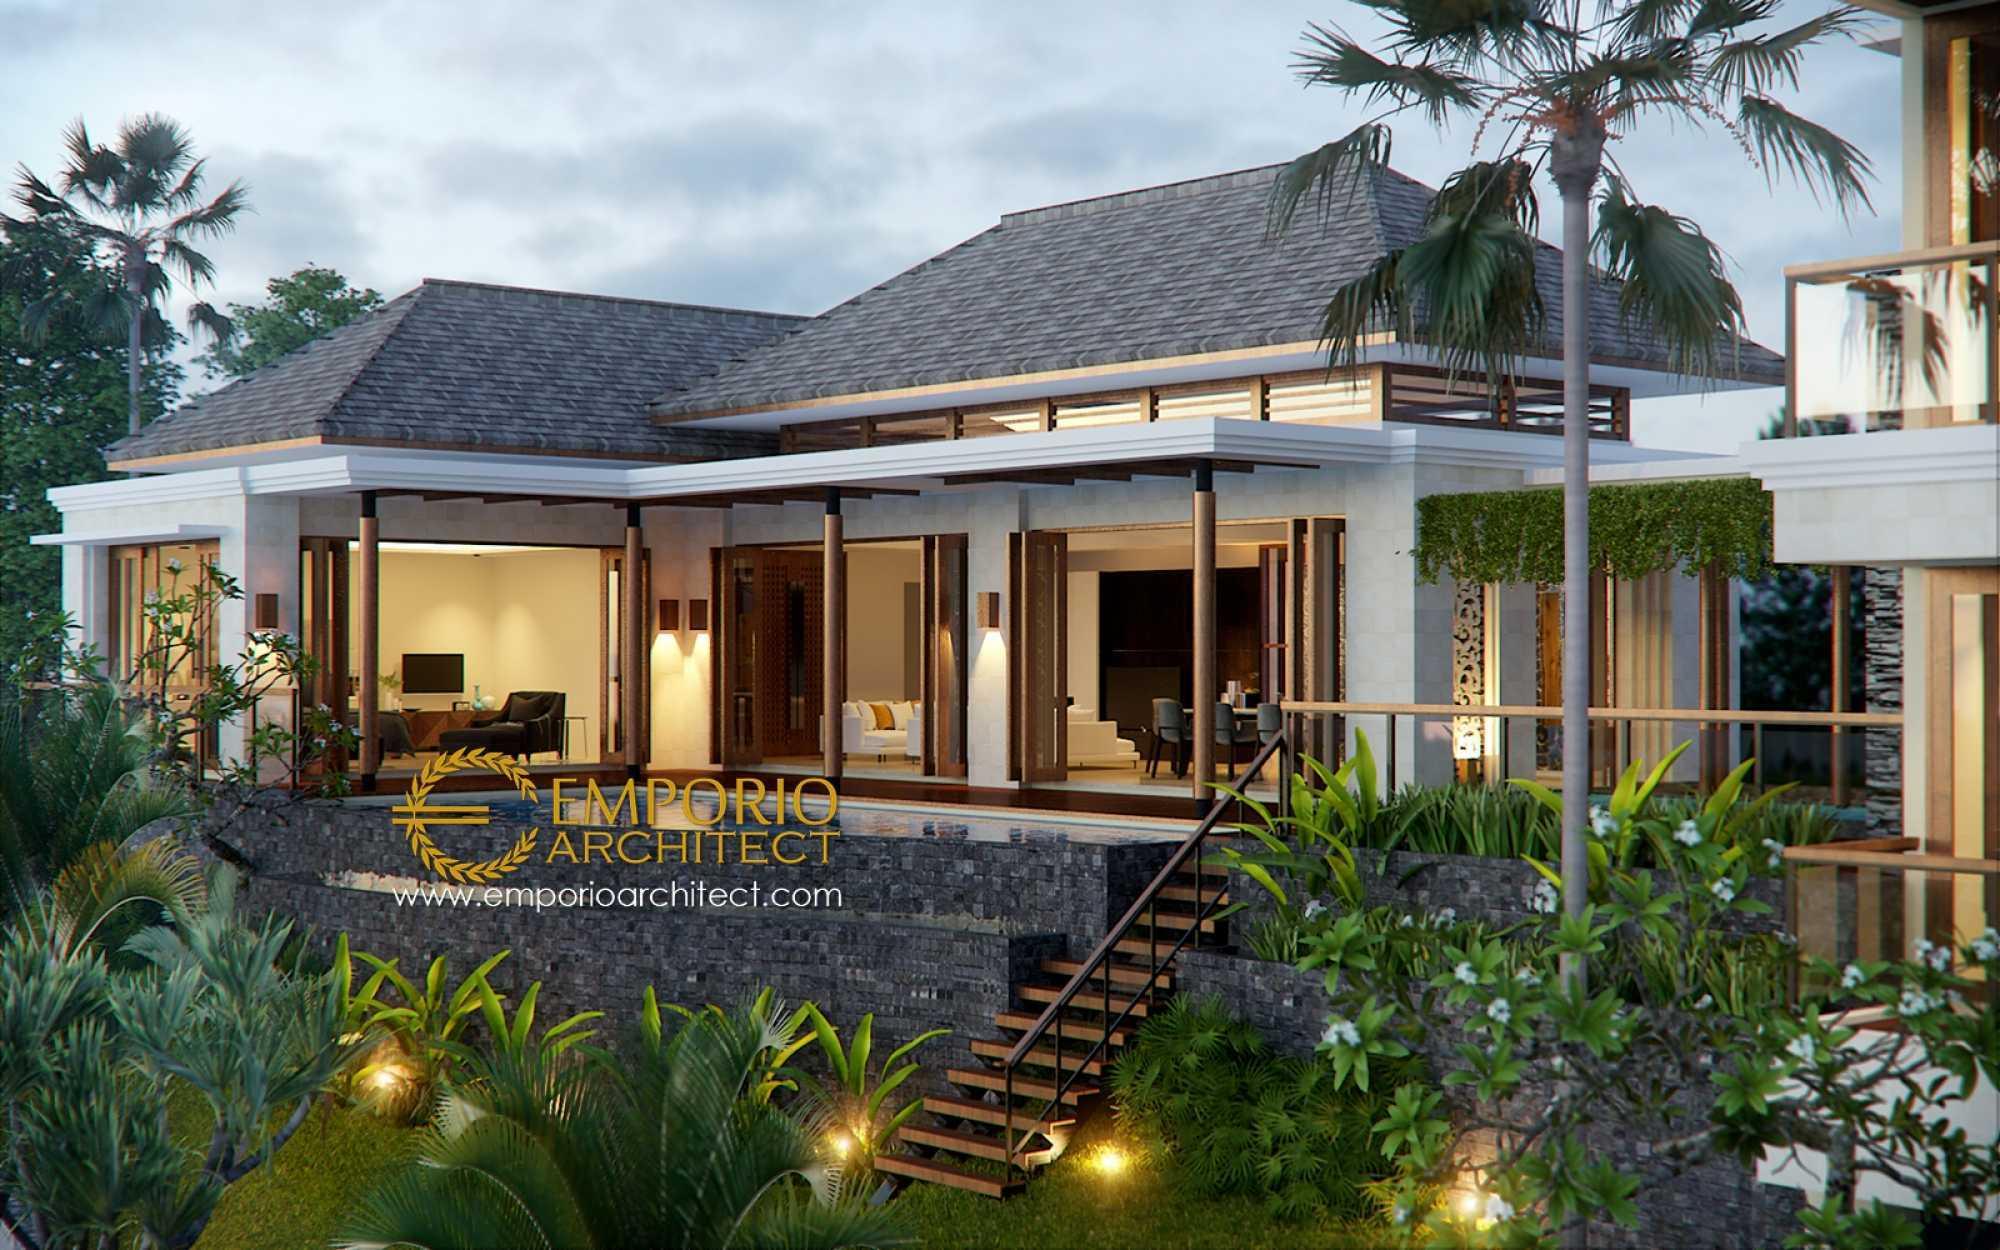 Emporio Architect Desain Rumah Villa Bali Tropis @ Bandung Bandung, Kota Bandung, Jawa Barat, Indonesia Bandung, Kota Bandung, Jawa Barat, Indonesia Emporio-Architect-Desain-Rumah-Villa-Bali-Tropis-Bandung  76596